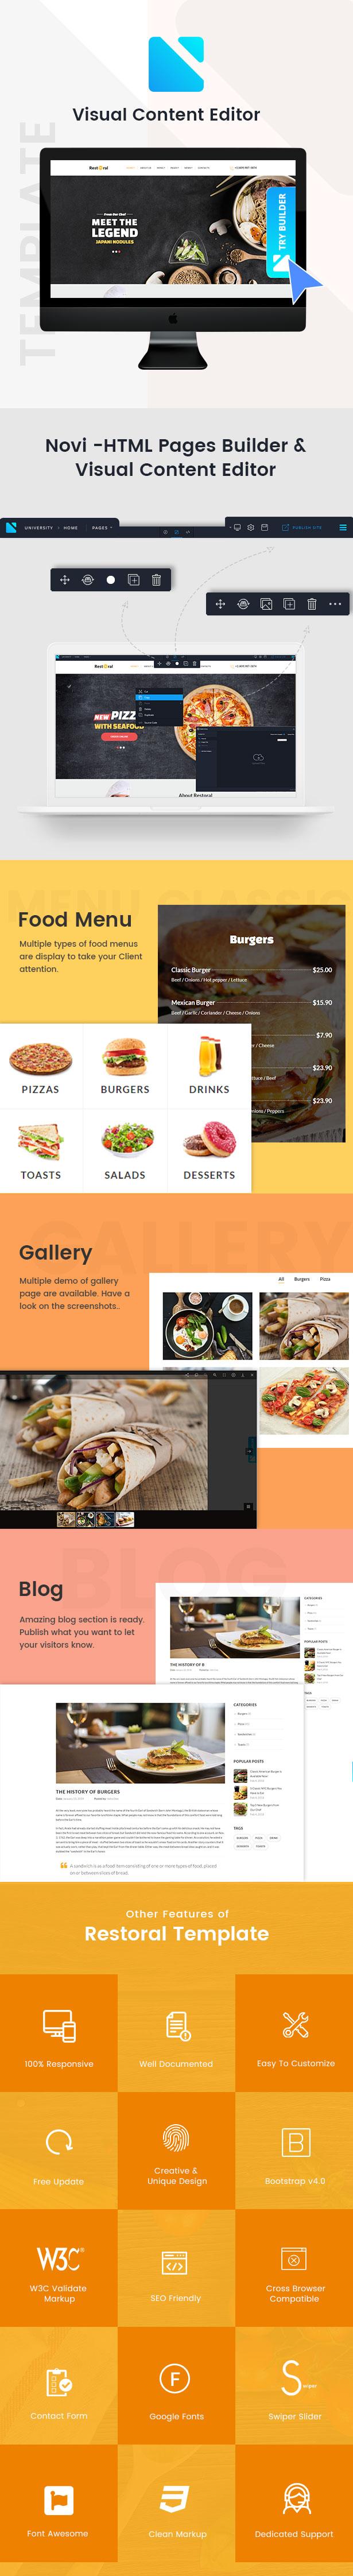 Restoral - Food & Restaurant HTML Responsive Bootstrap 4 Template - 2